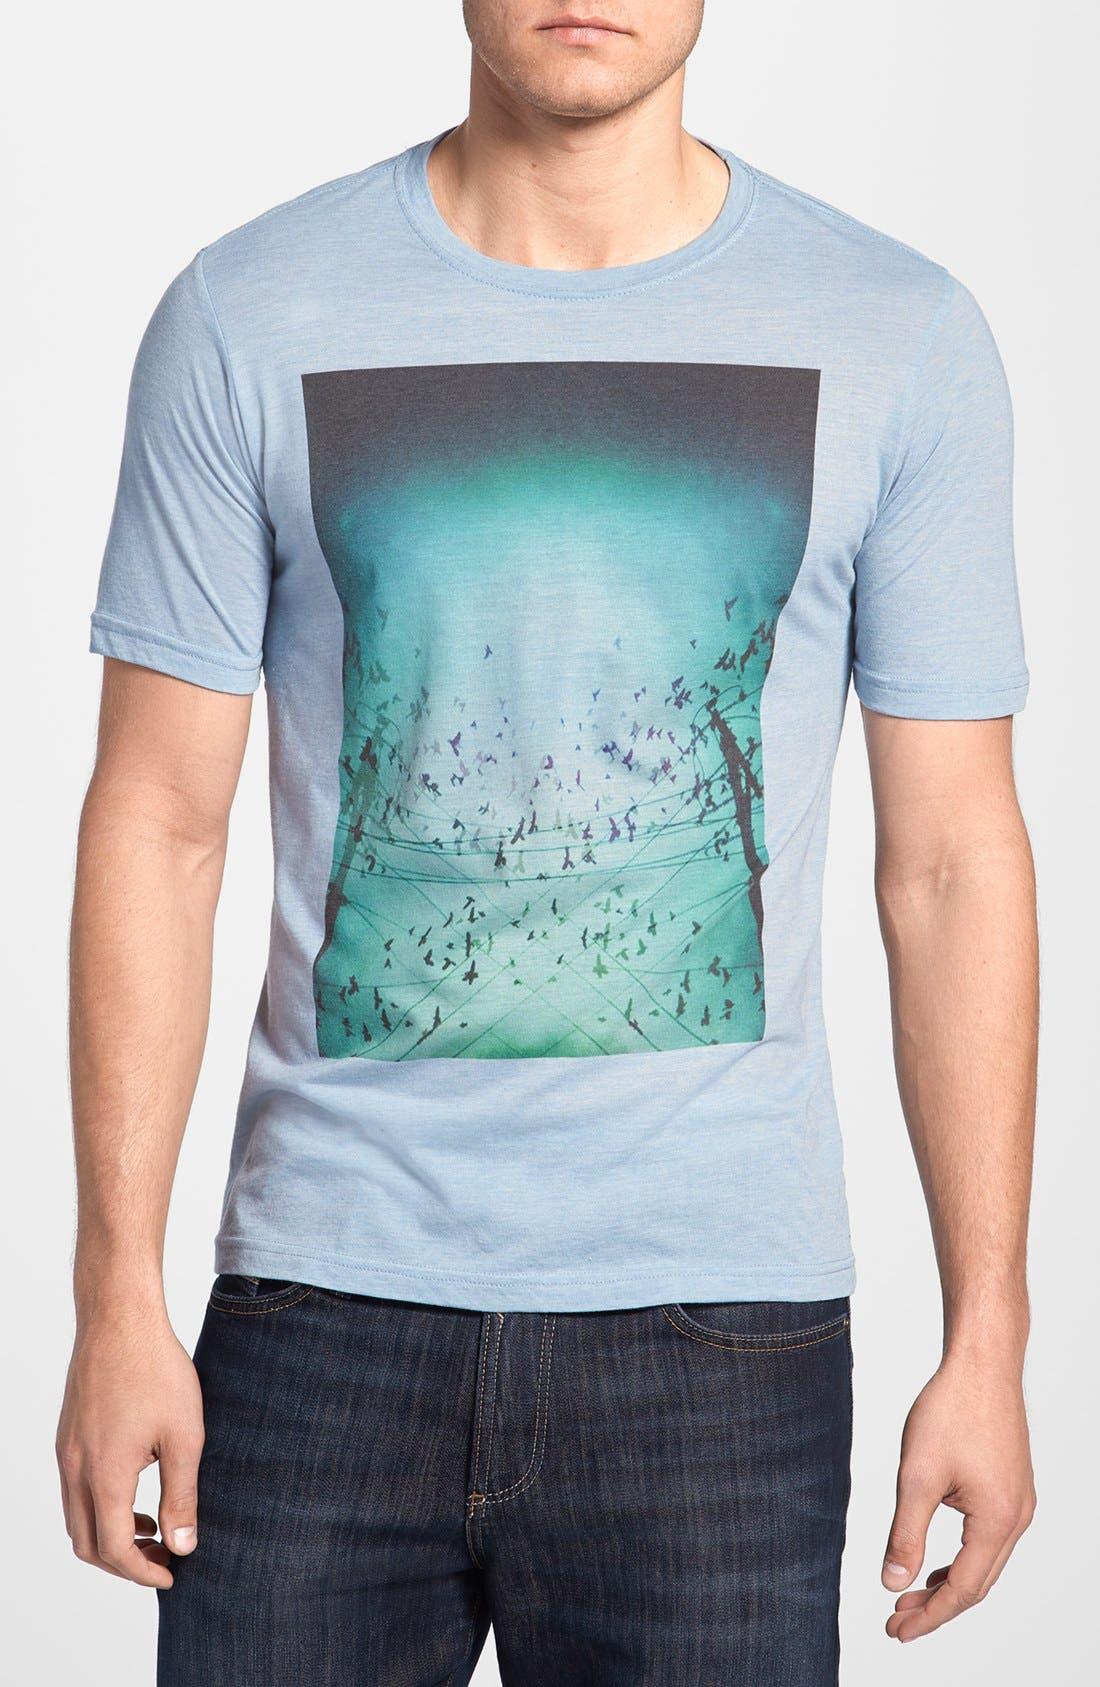 Main Image - Bowery Supply 'Sky Birds' Graphic T-Shirt